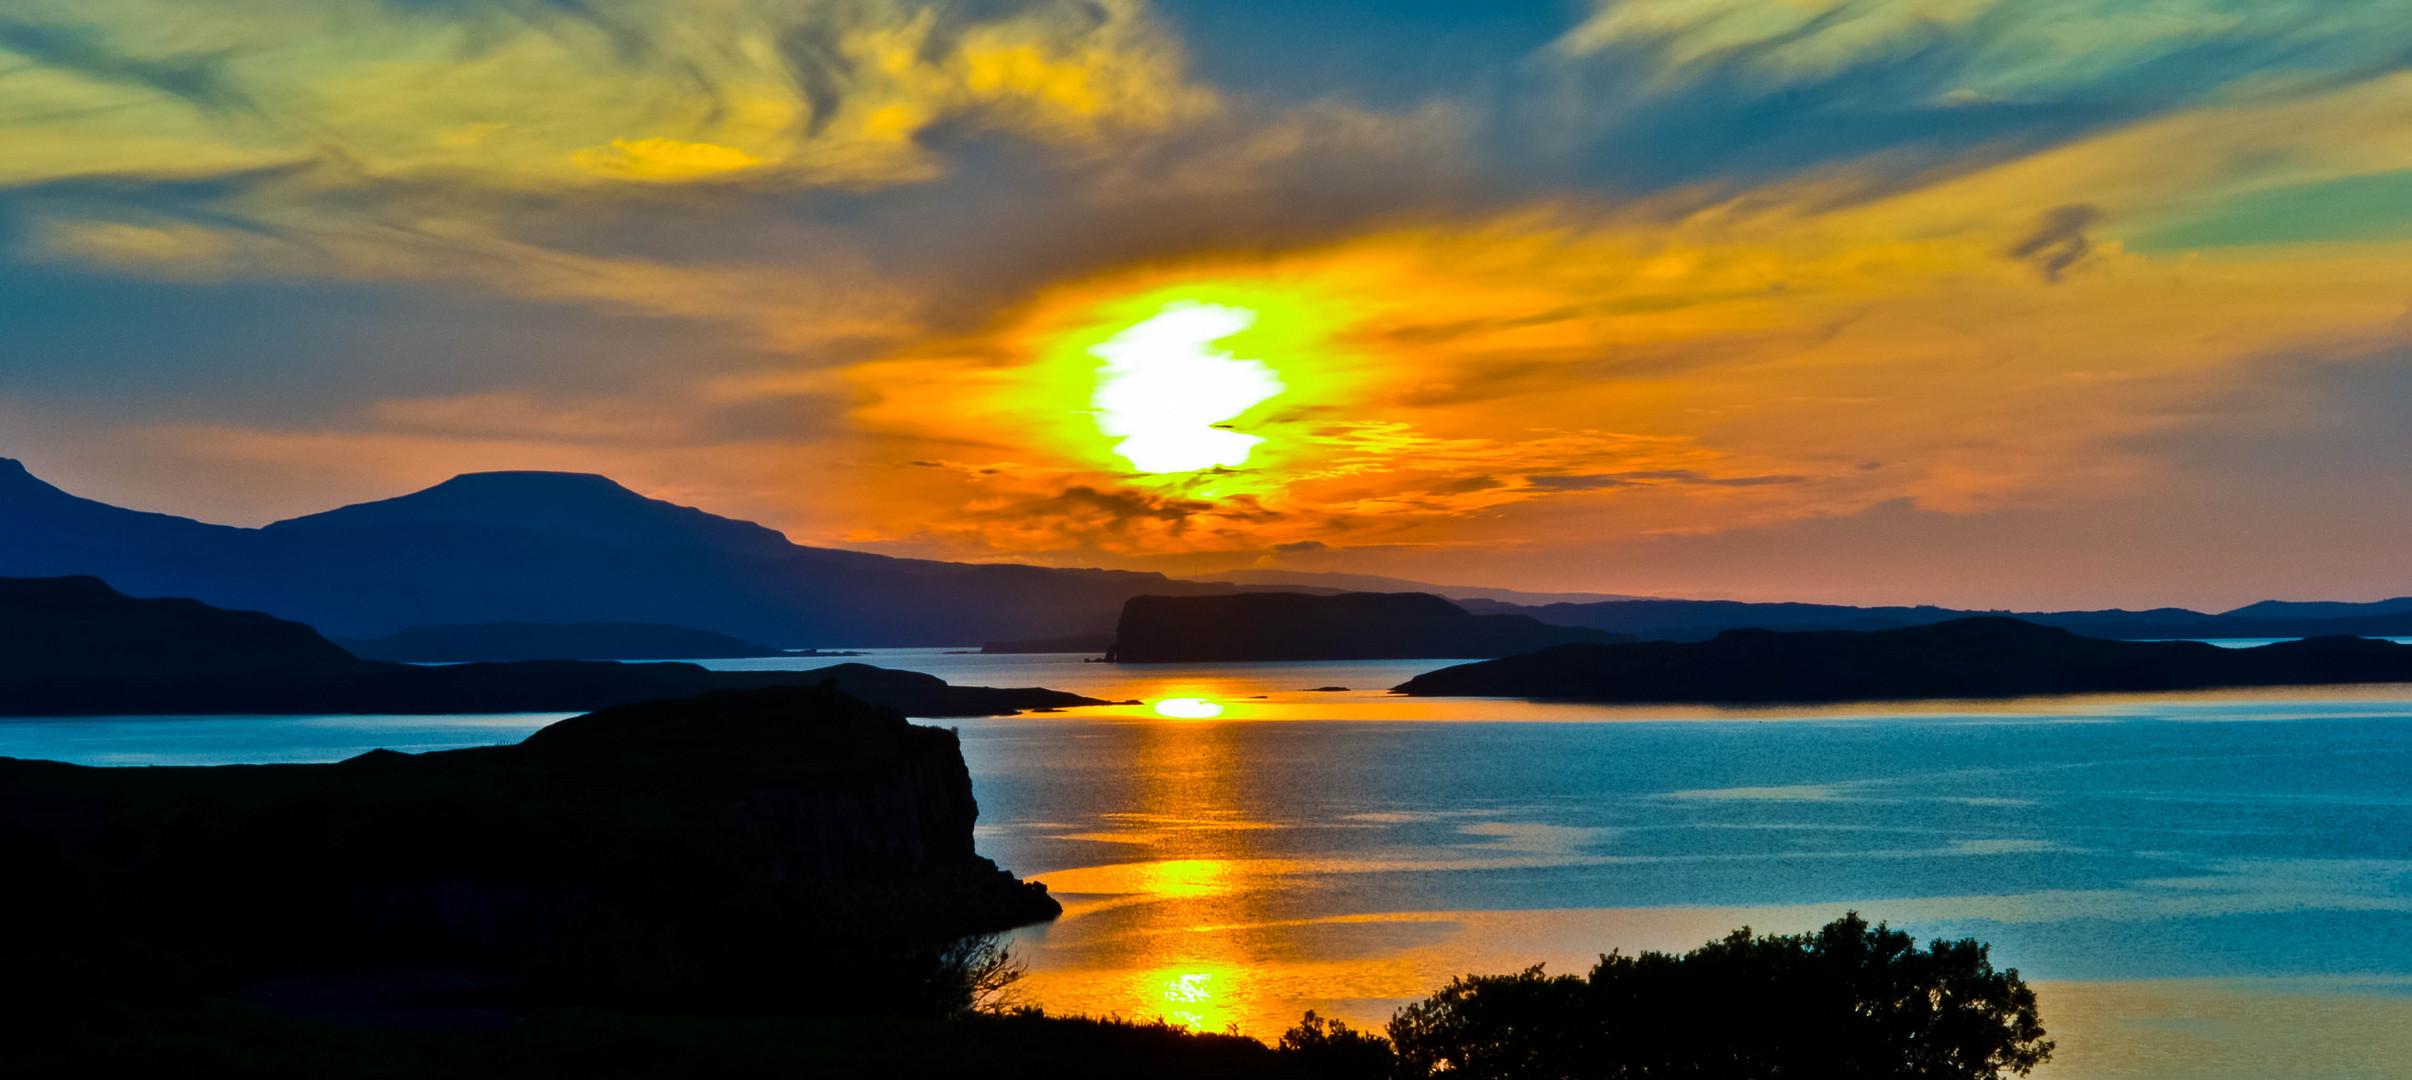 Sunset over Fiskavaig Bay, Isle of Skye